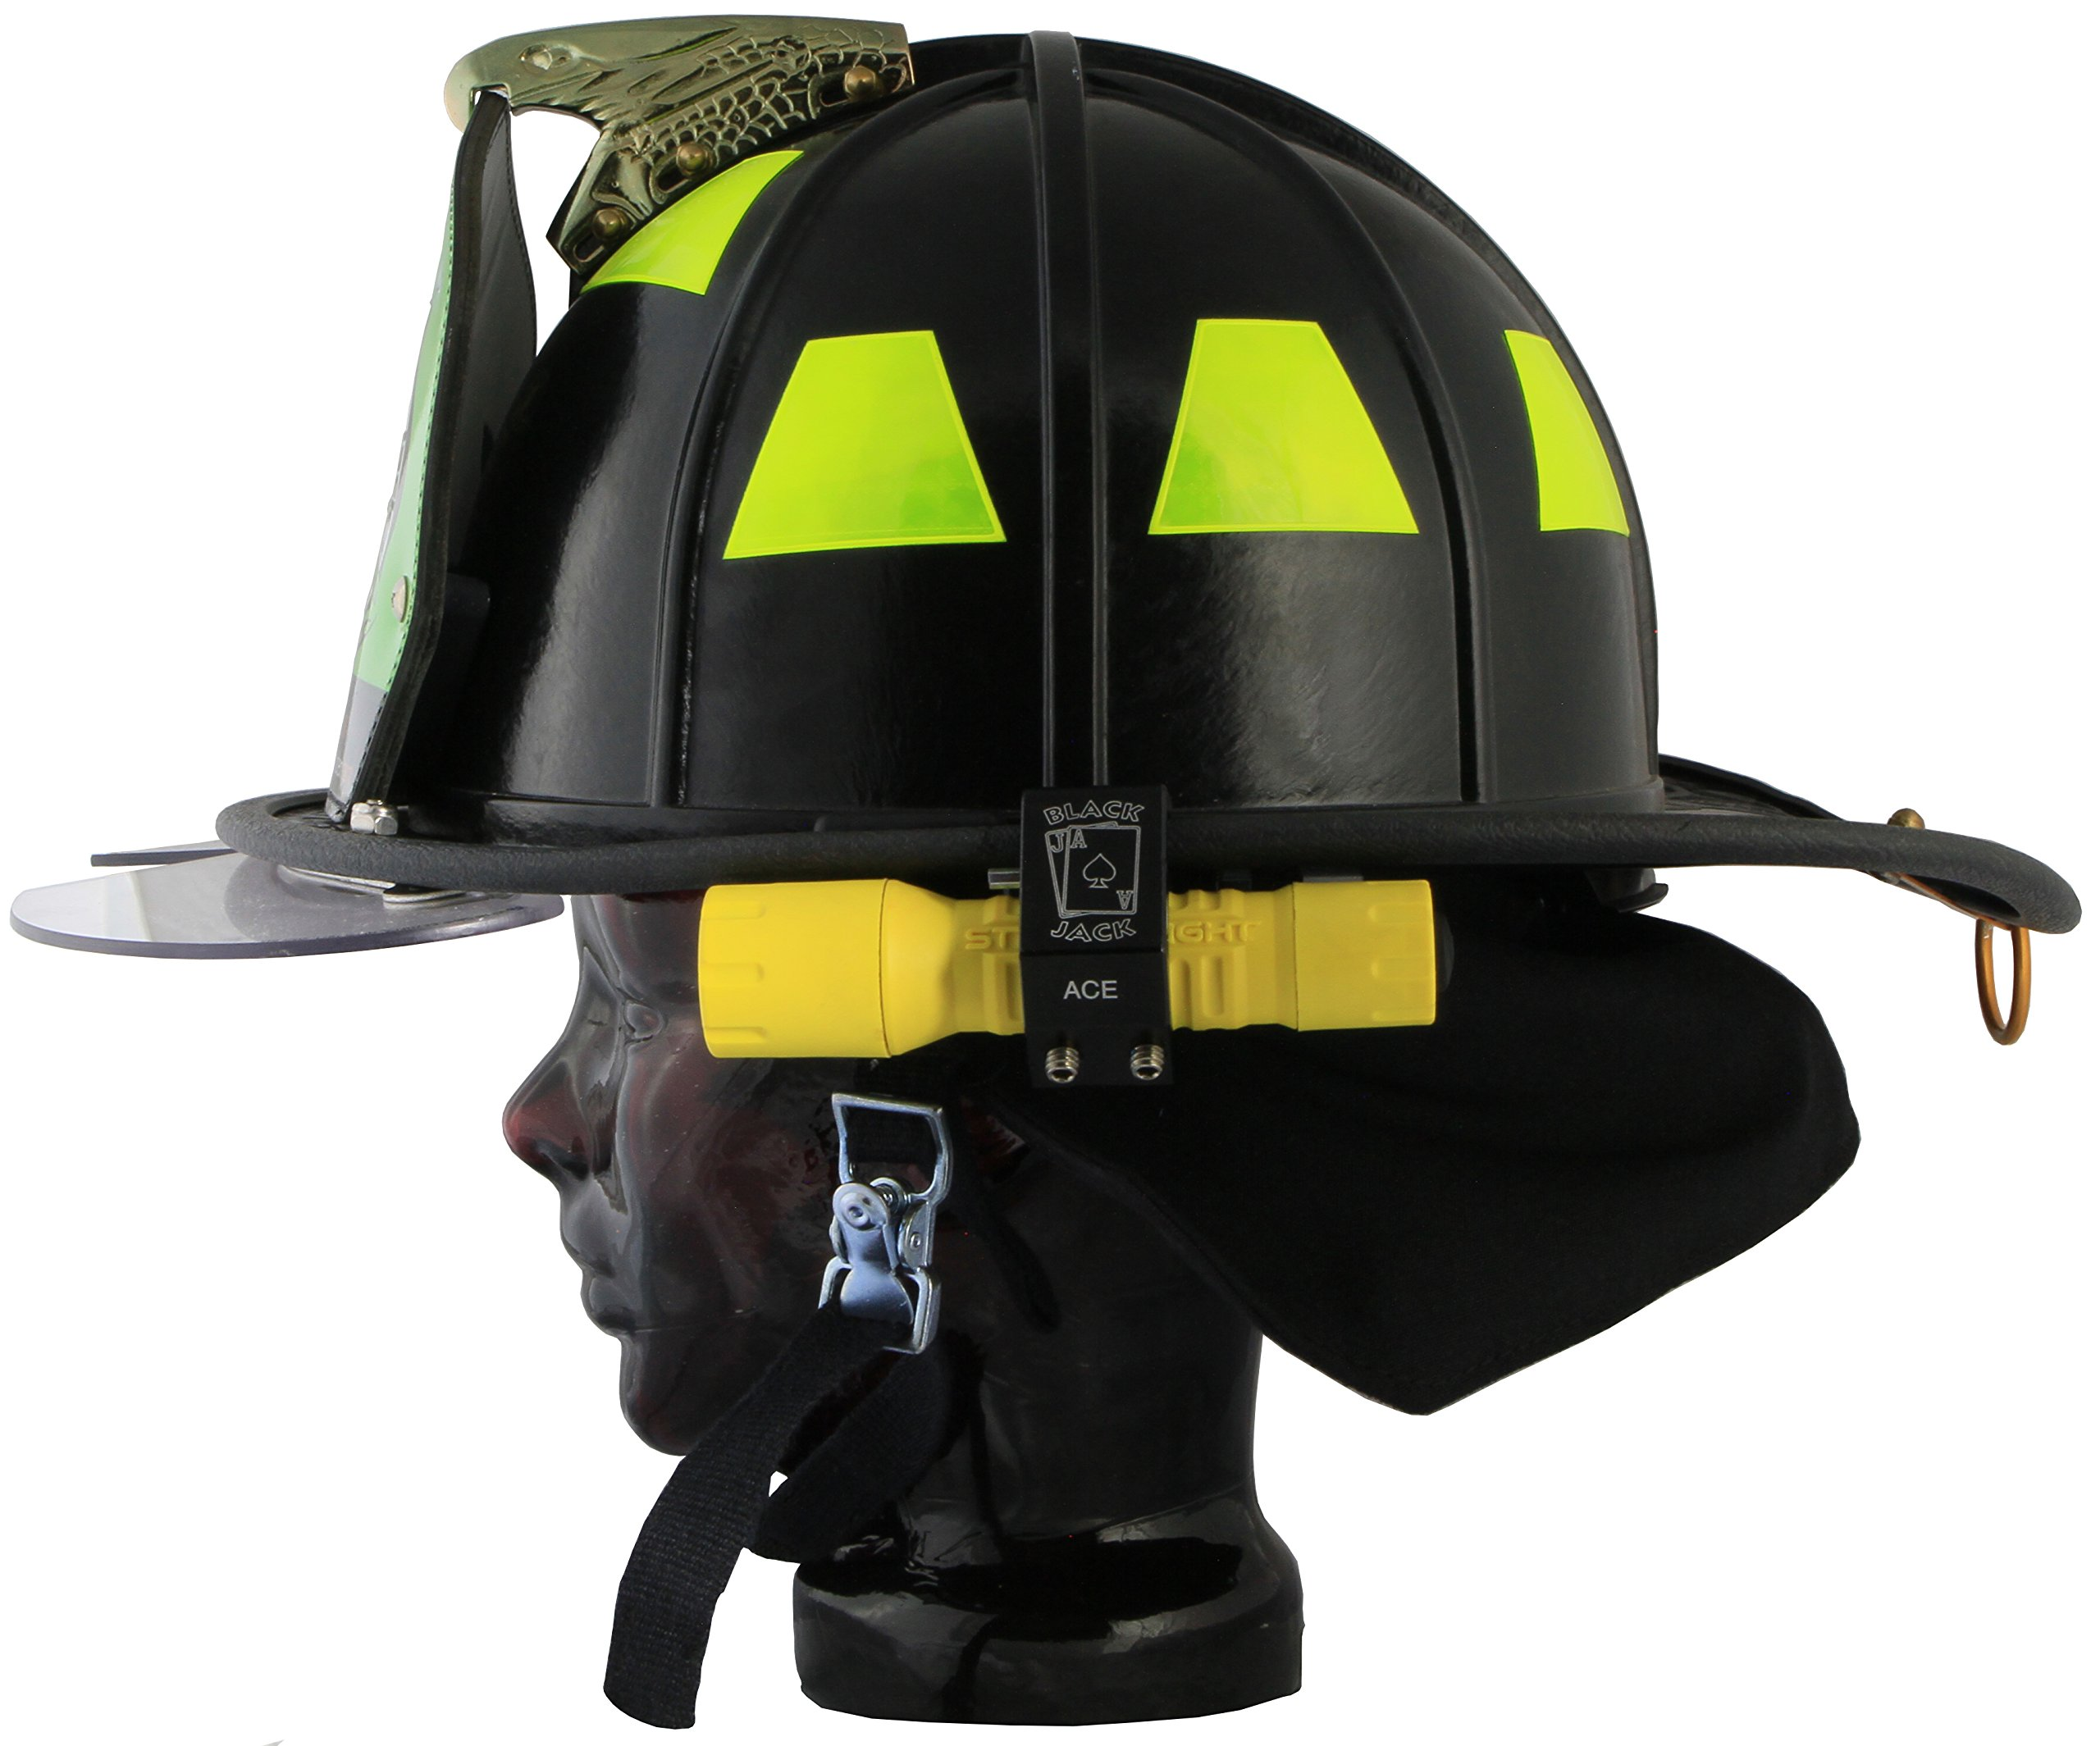 Blackjack ACE Firefighter Helmet Aluminum Flashlight Holder by Blackjack Fire & Safety (Image #7)